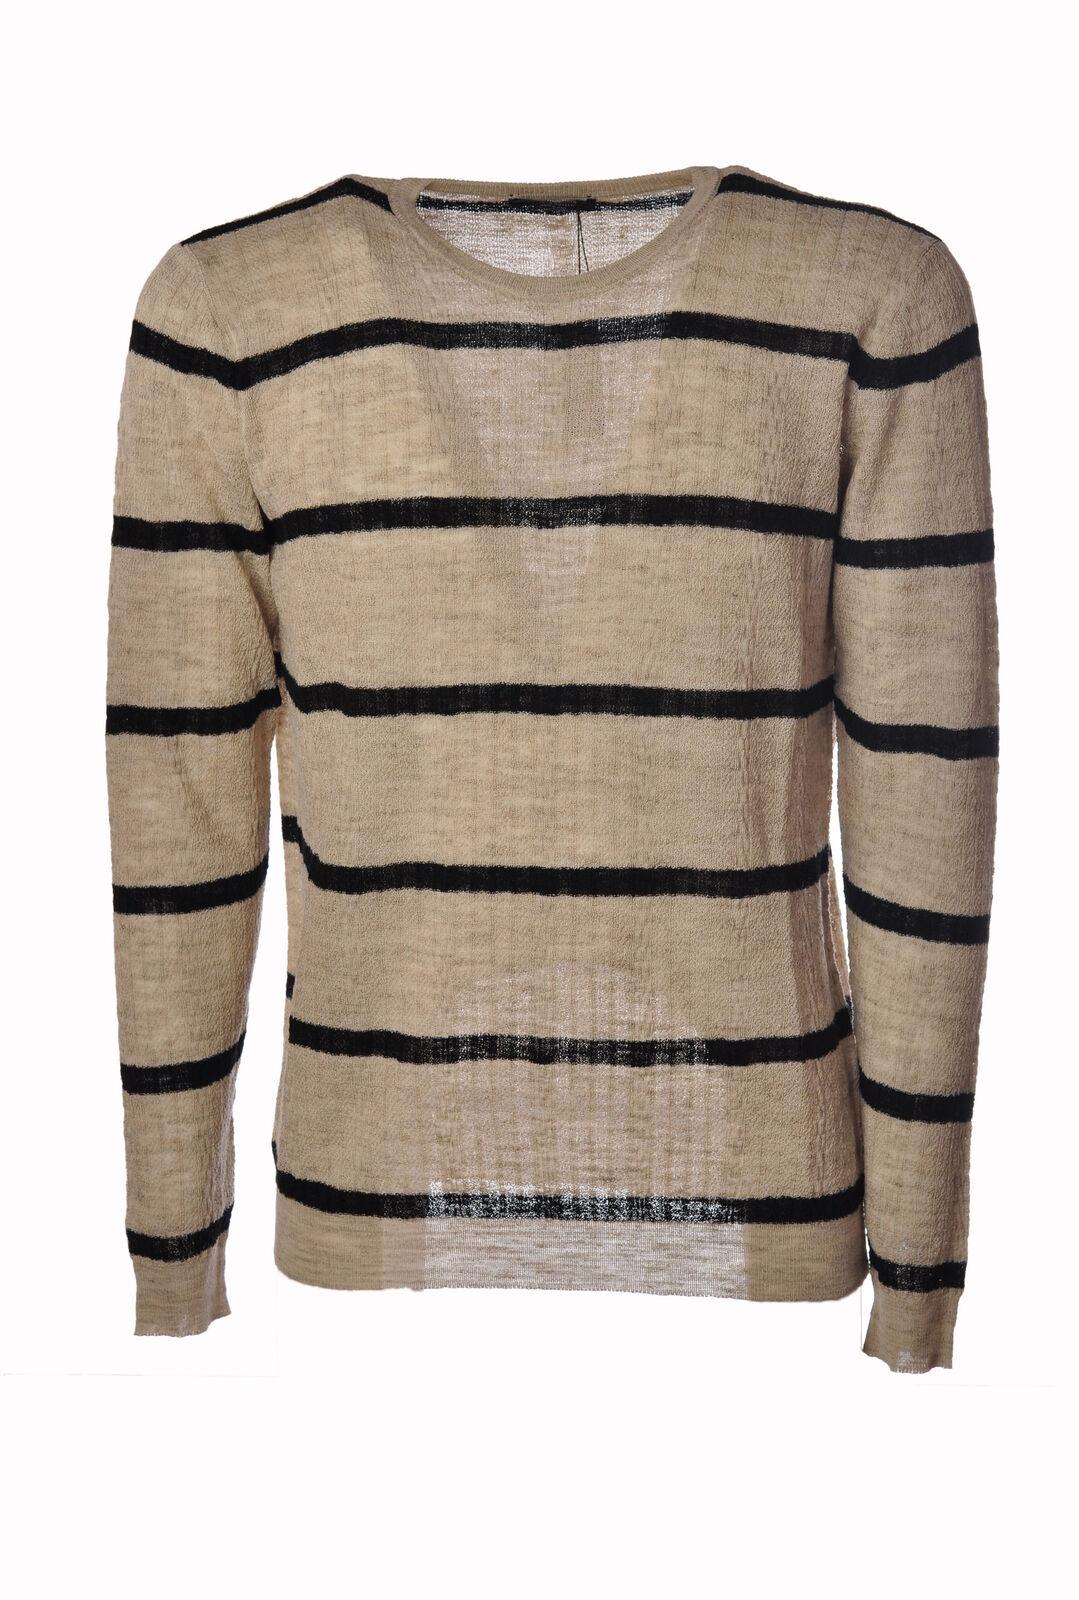 Roberto Collina  -  Sweaters - Male - Beige - 3214115A184025